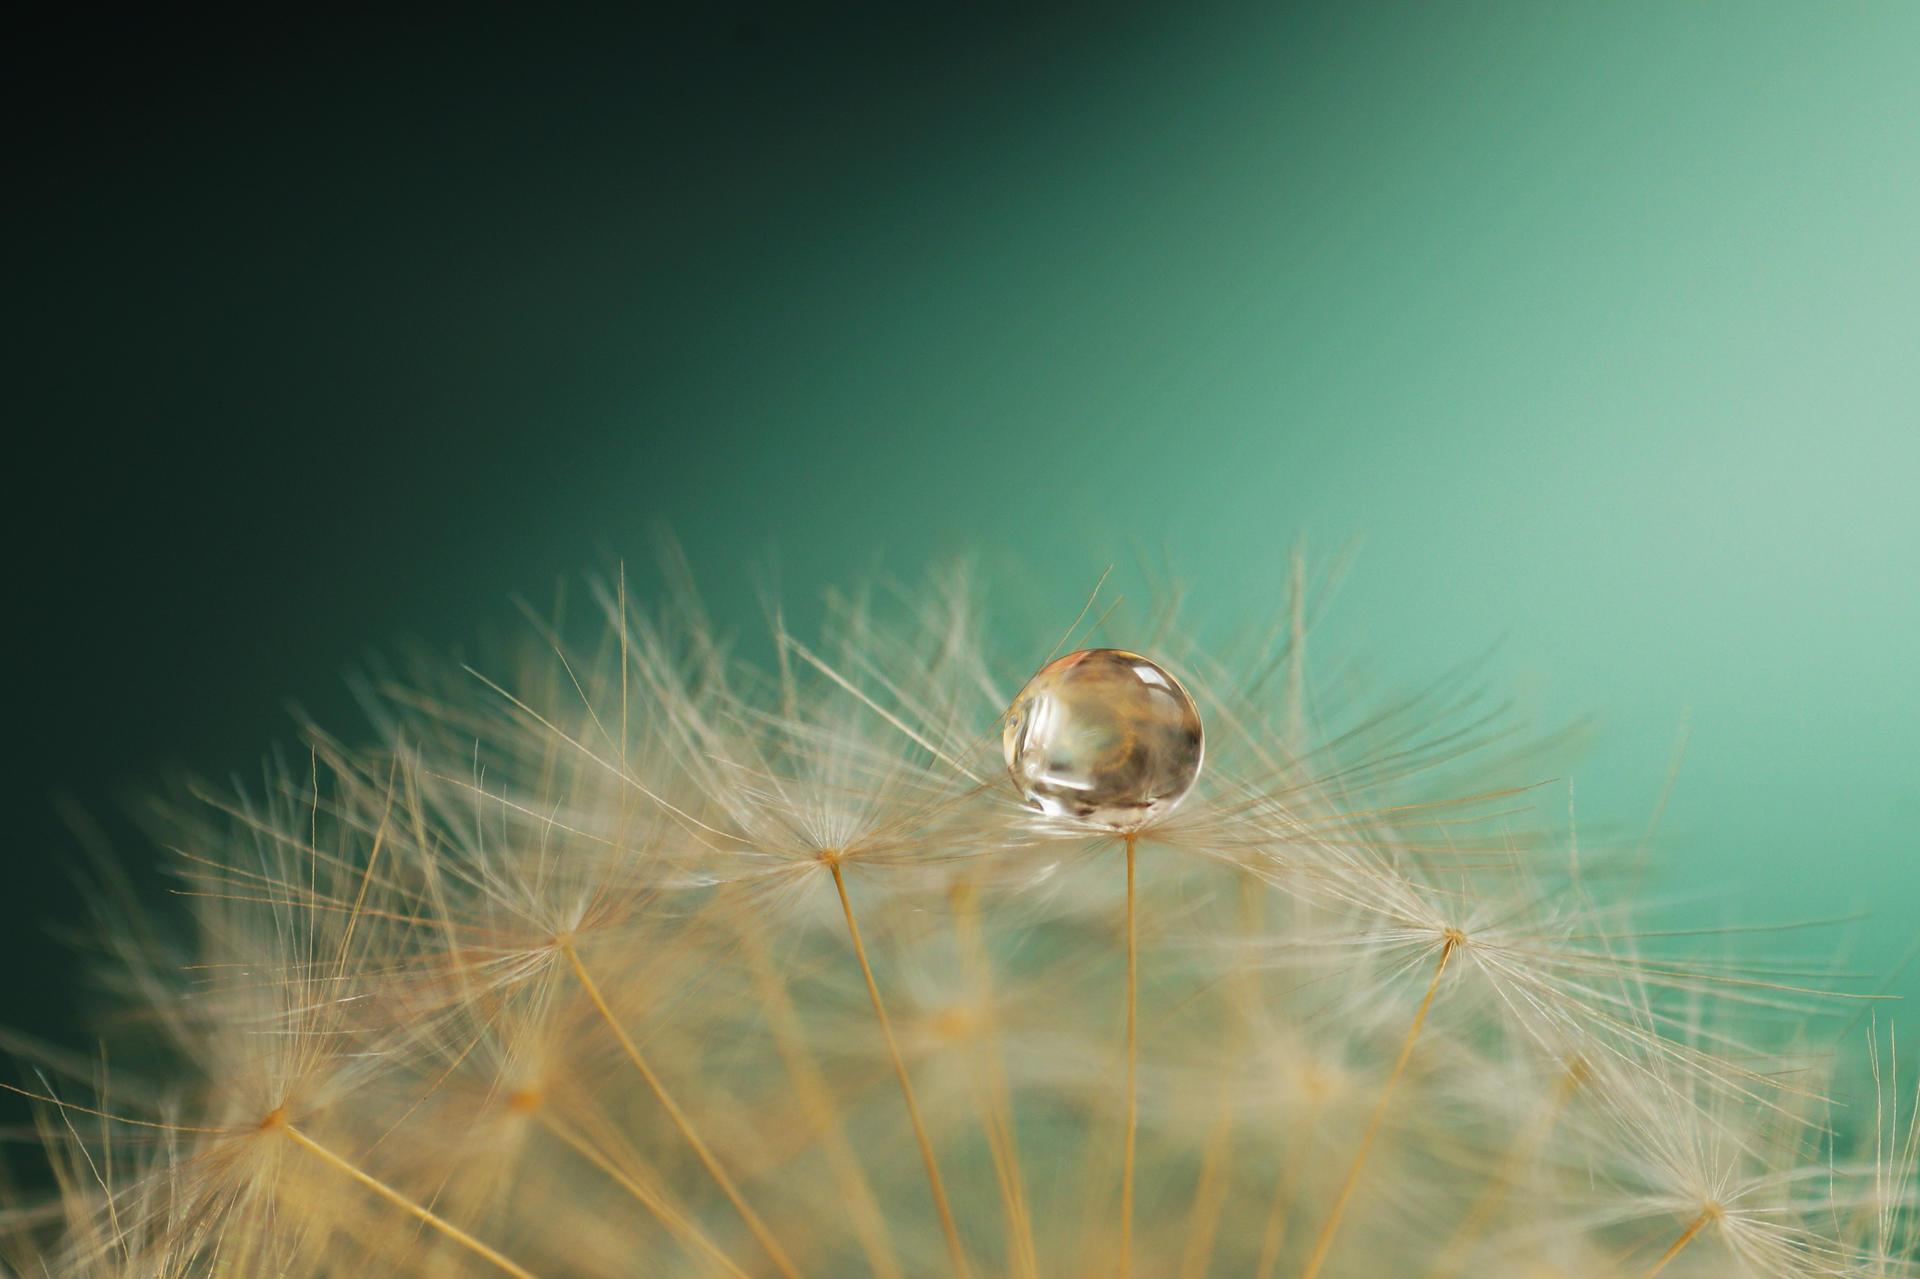 Dandelion #8